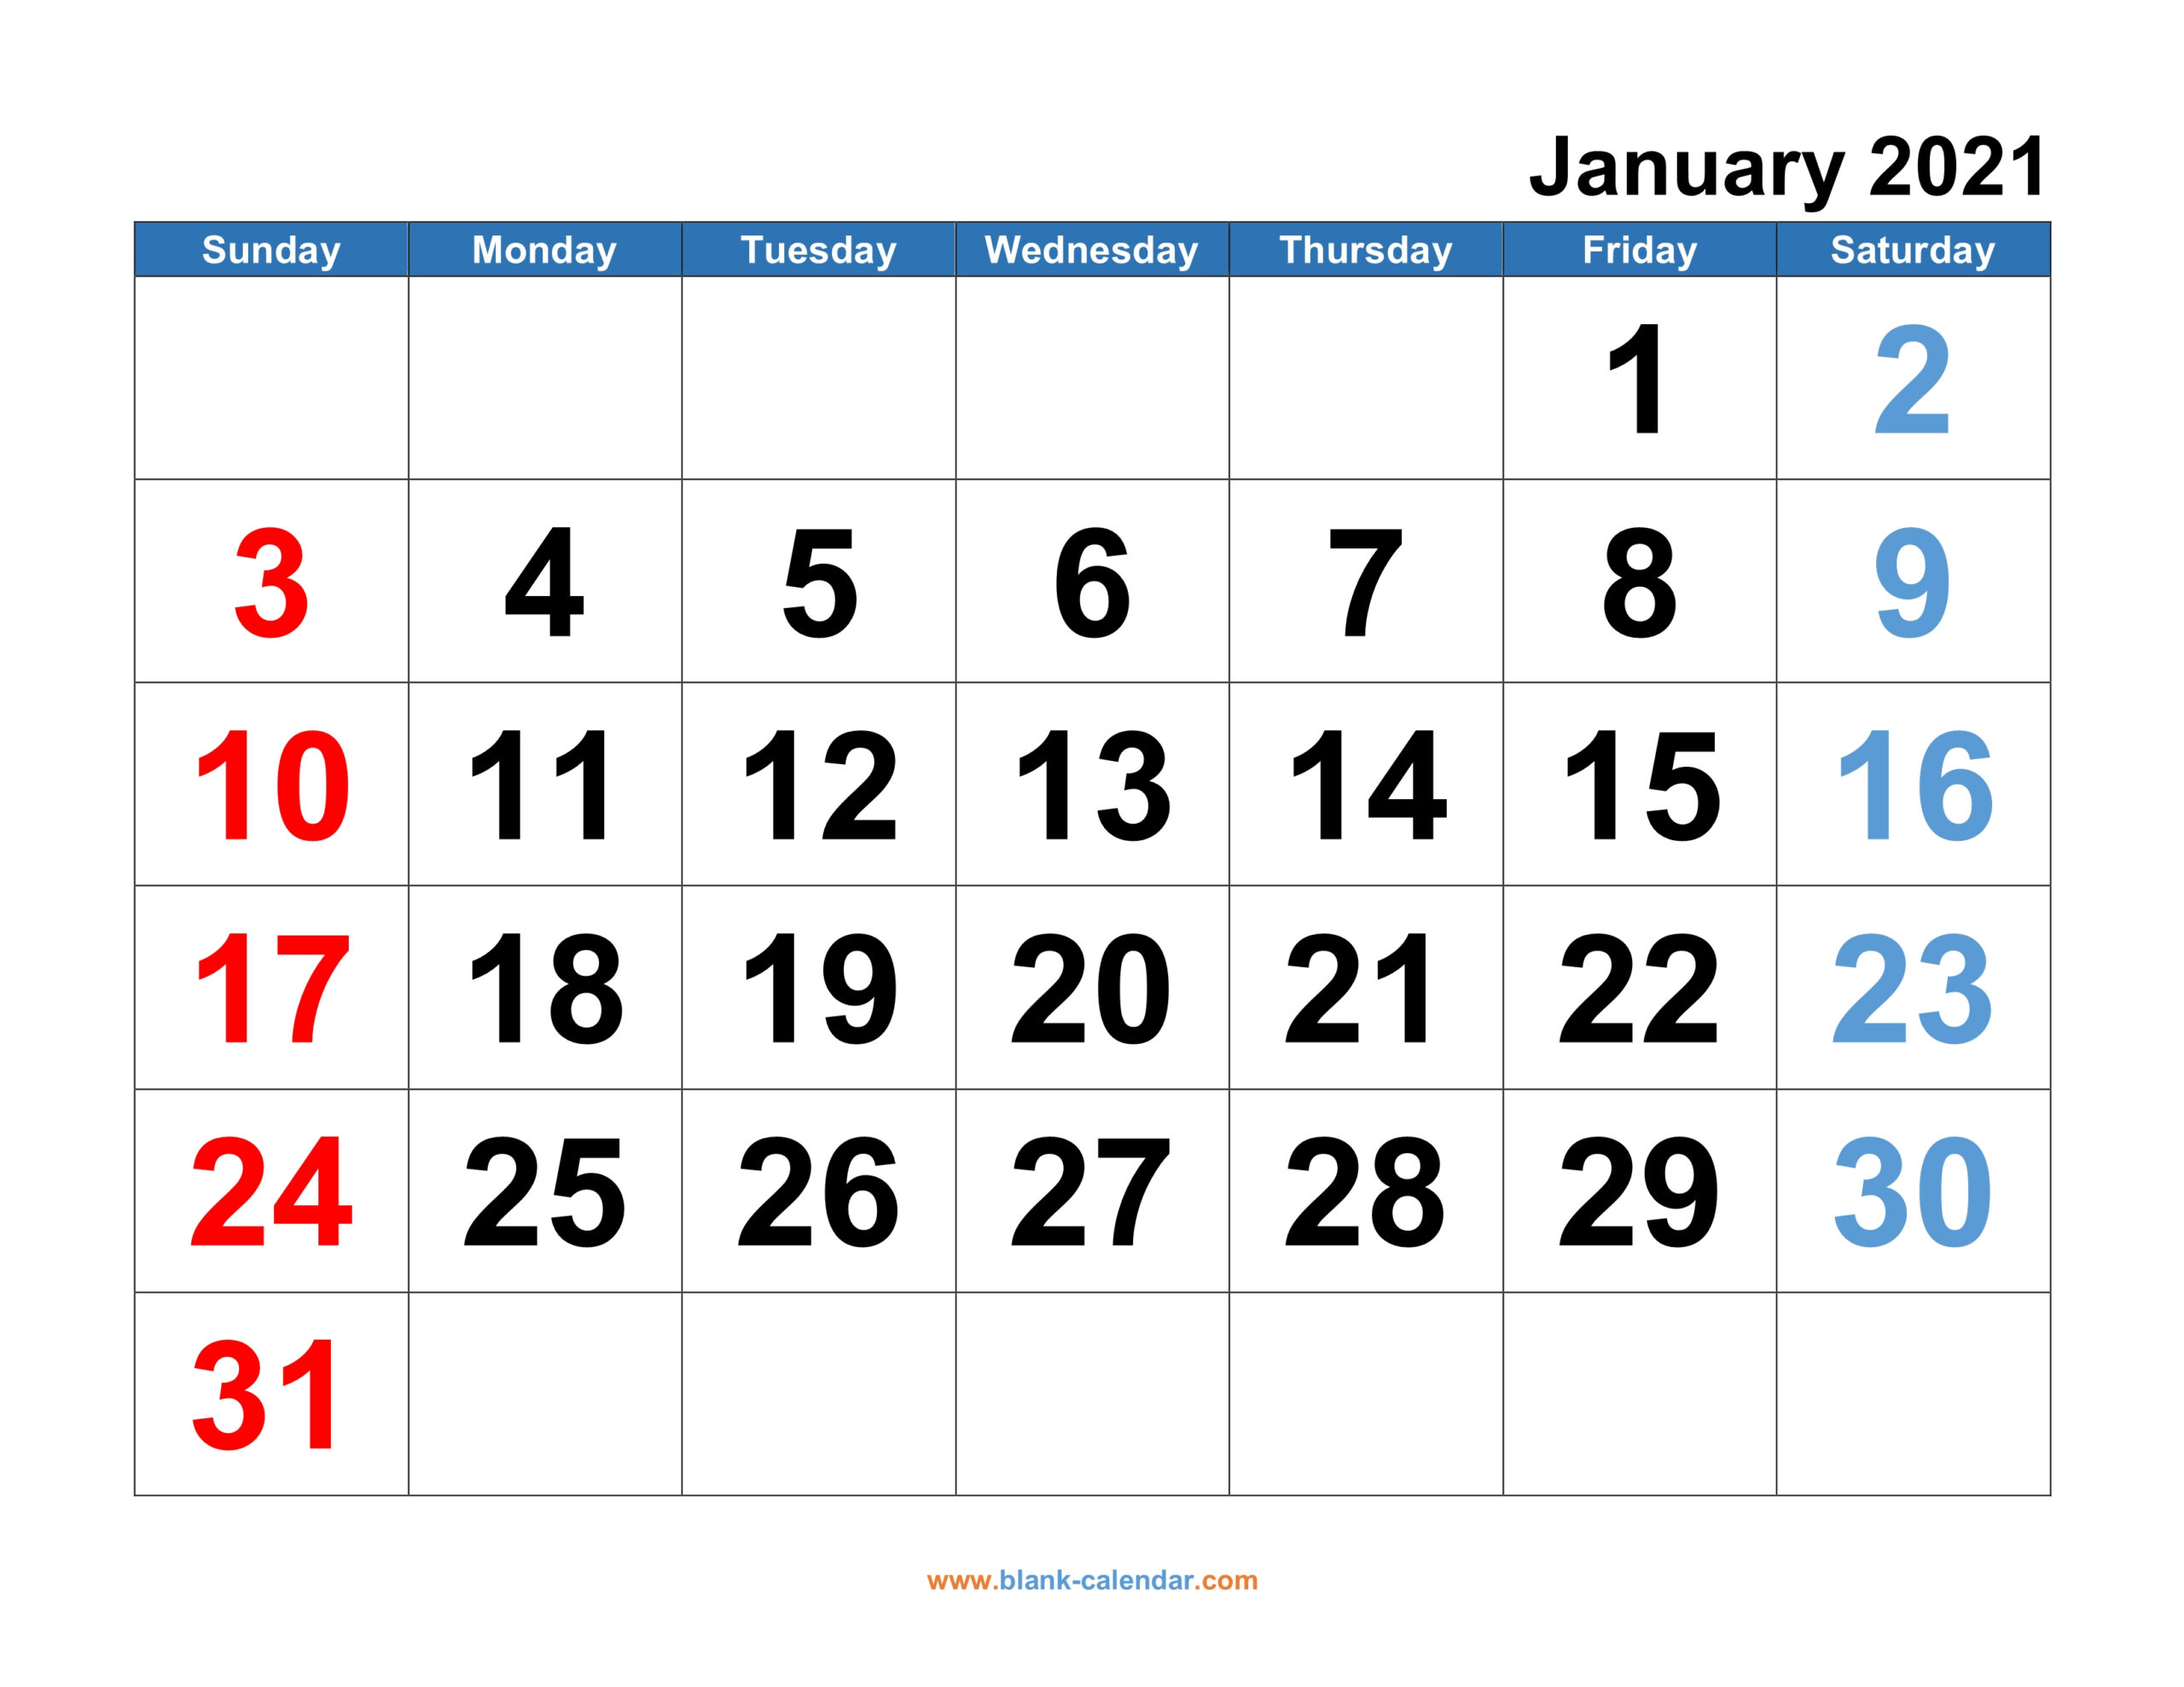 20+ January 2021 Calendar Big Numbers - Free Download